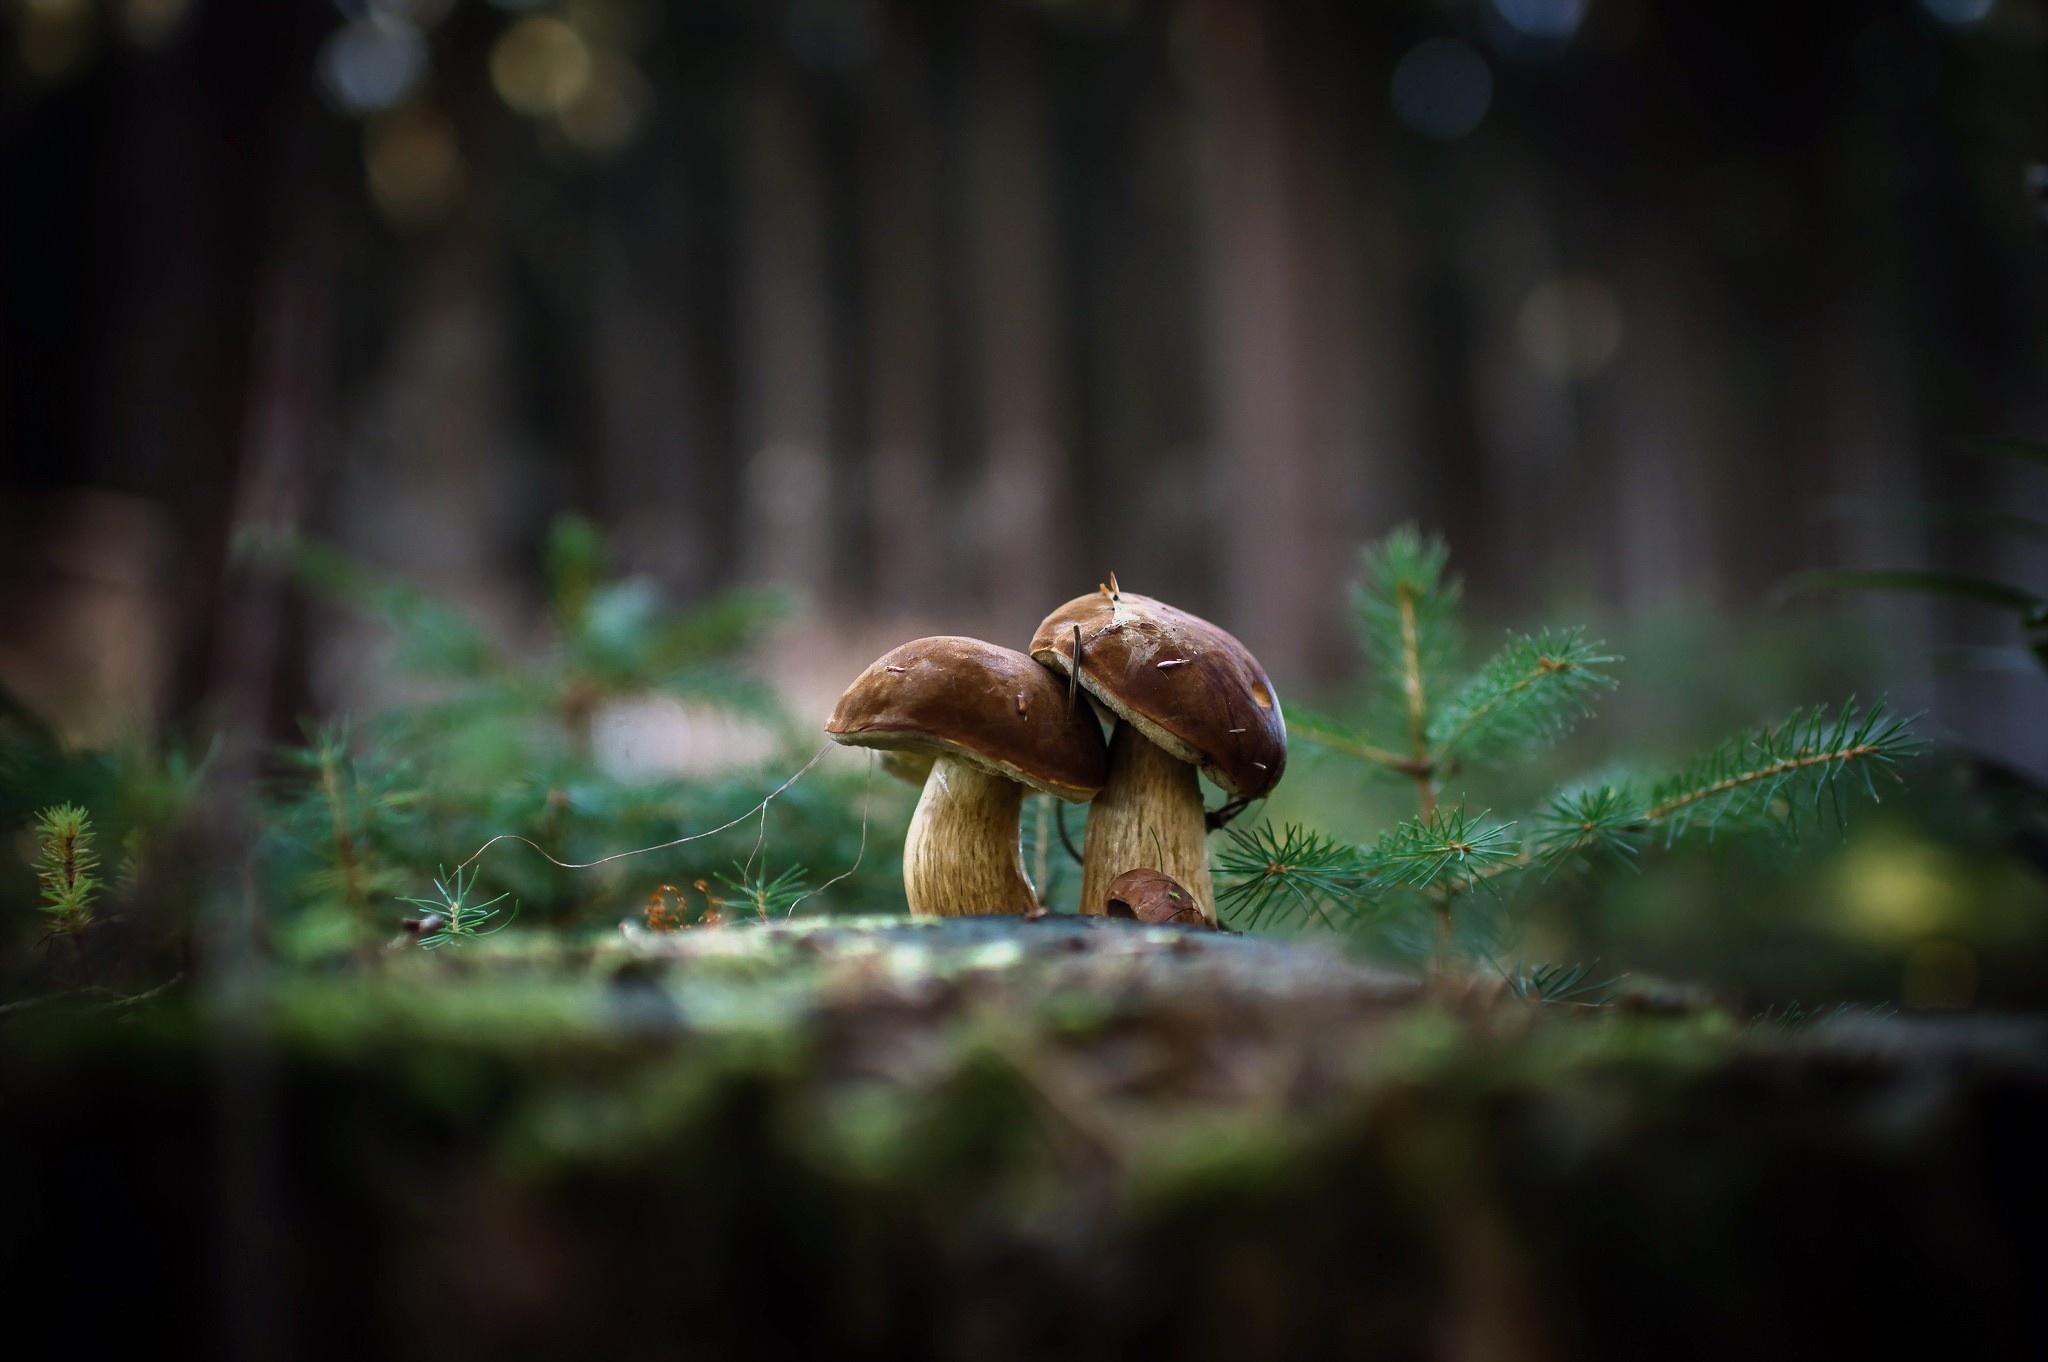 Macro Mushrooms best wallpaper